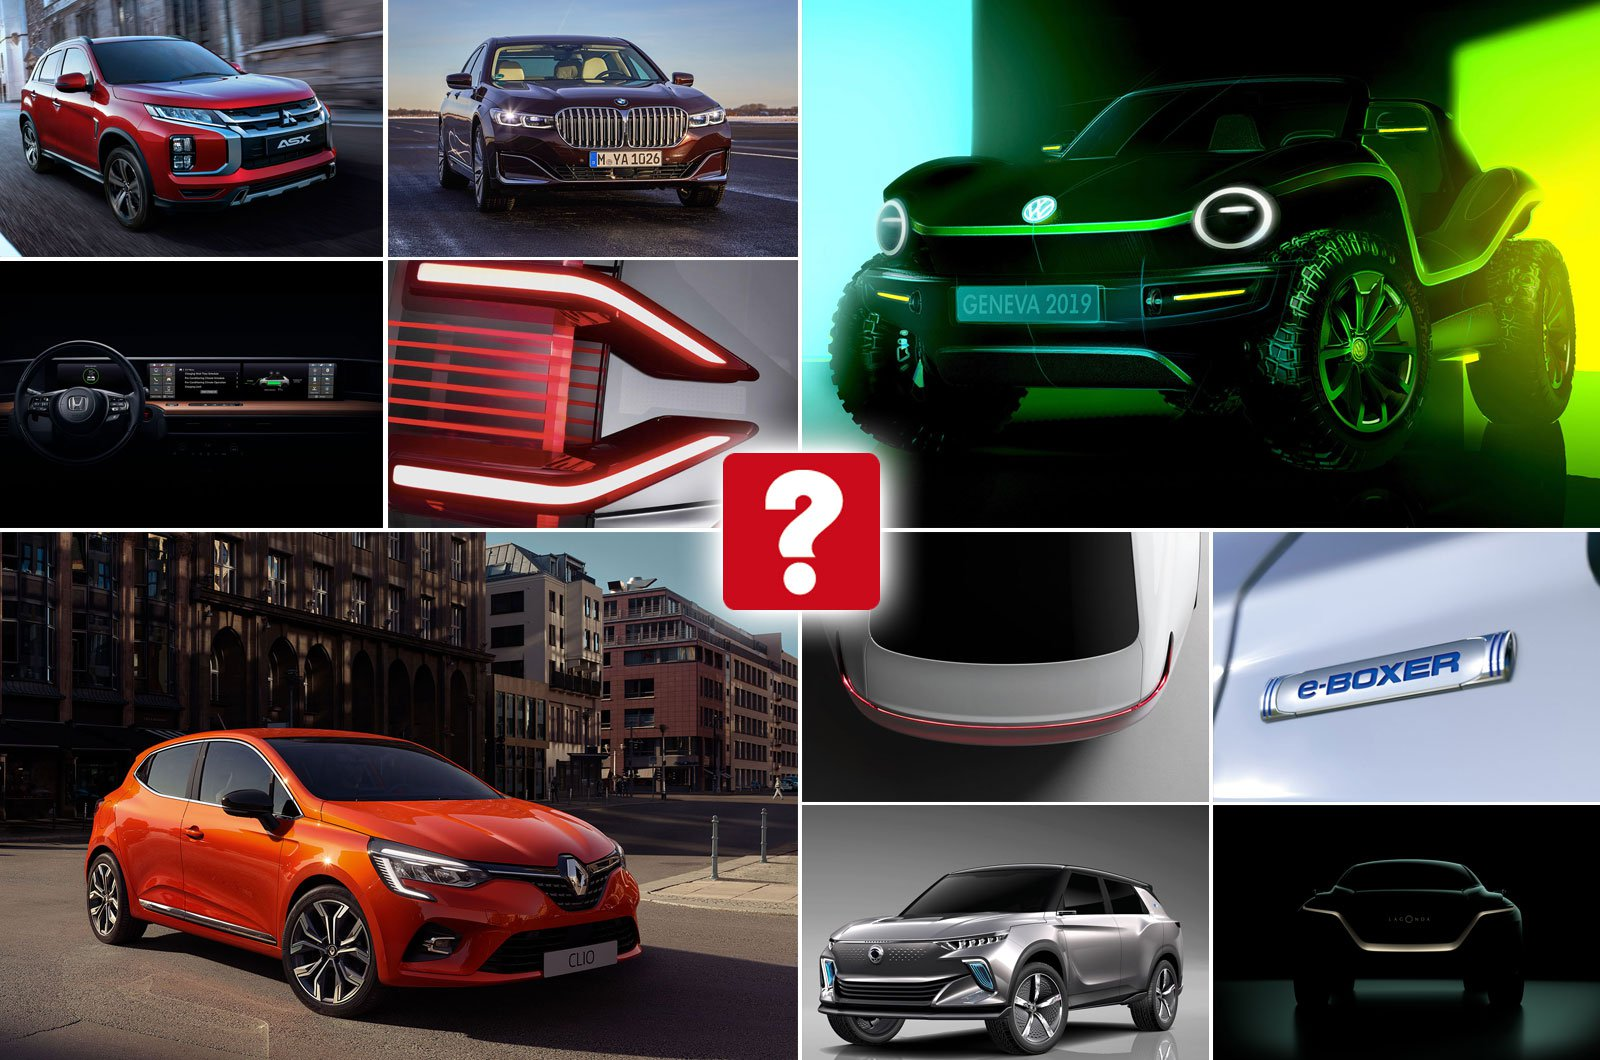 Star cars of the Geneva motor show 2019